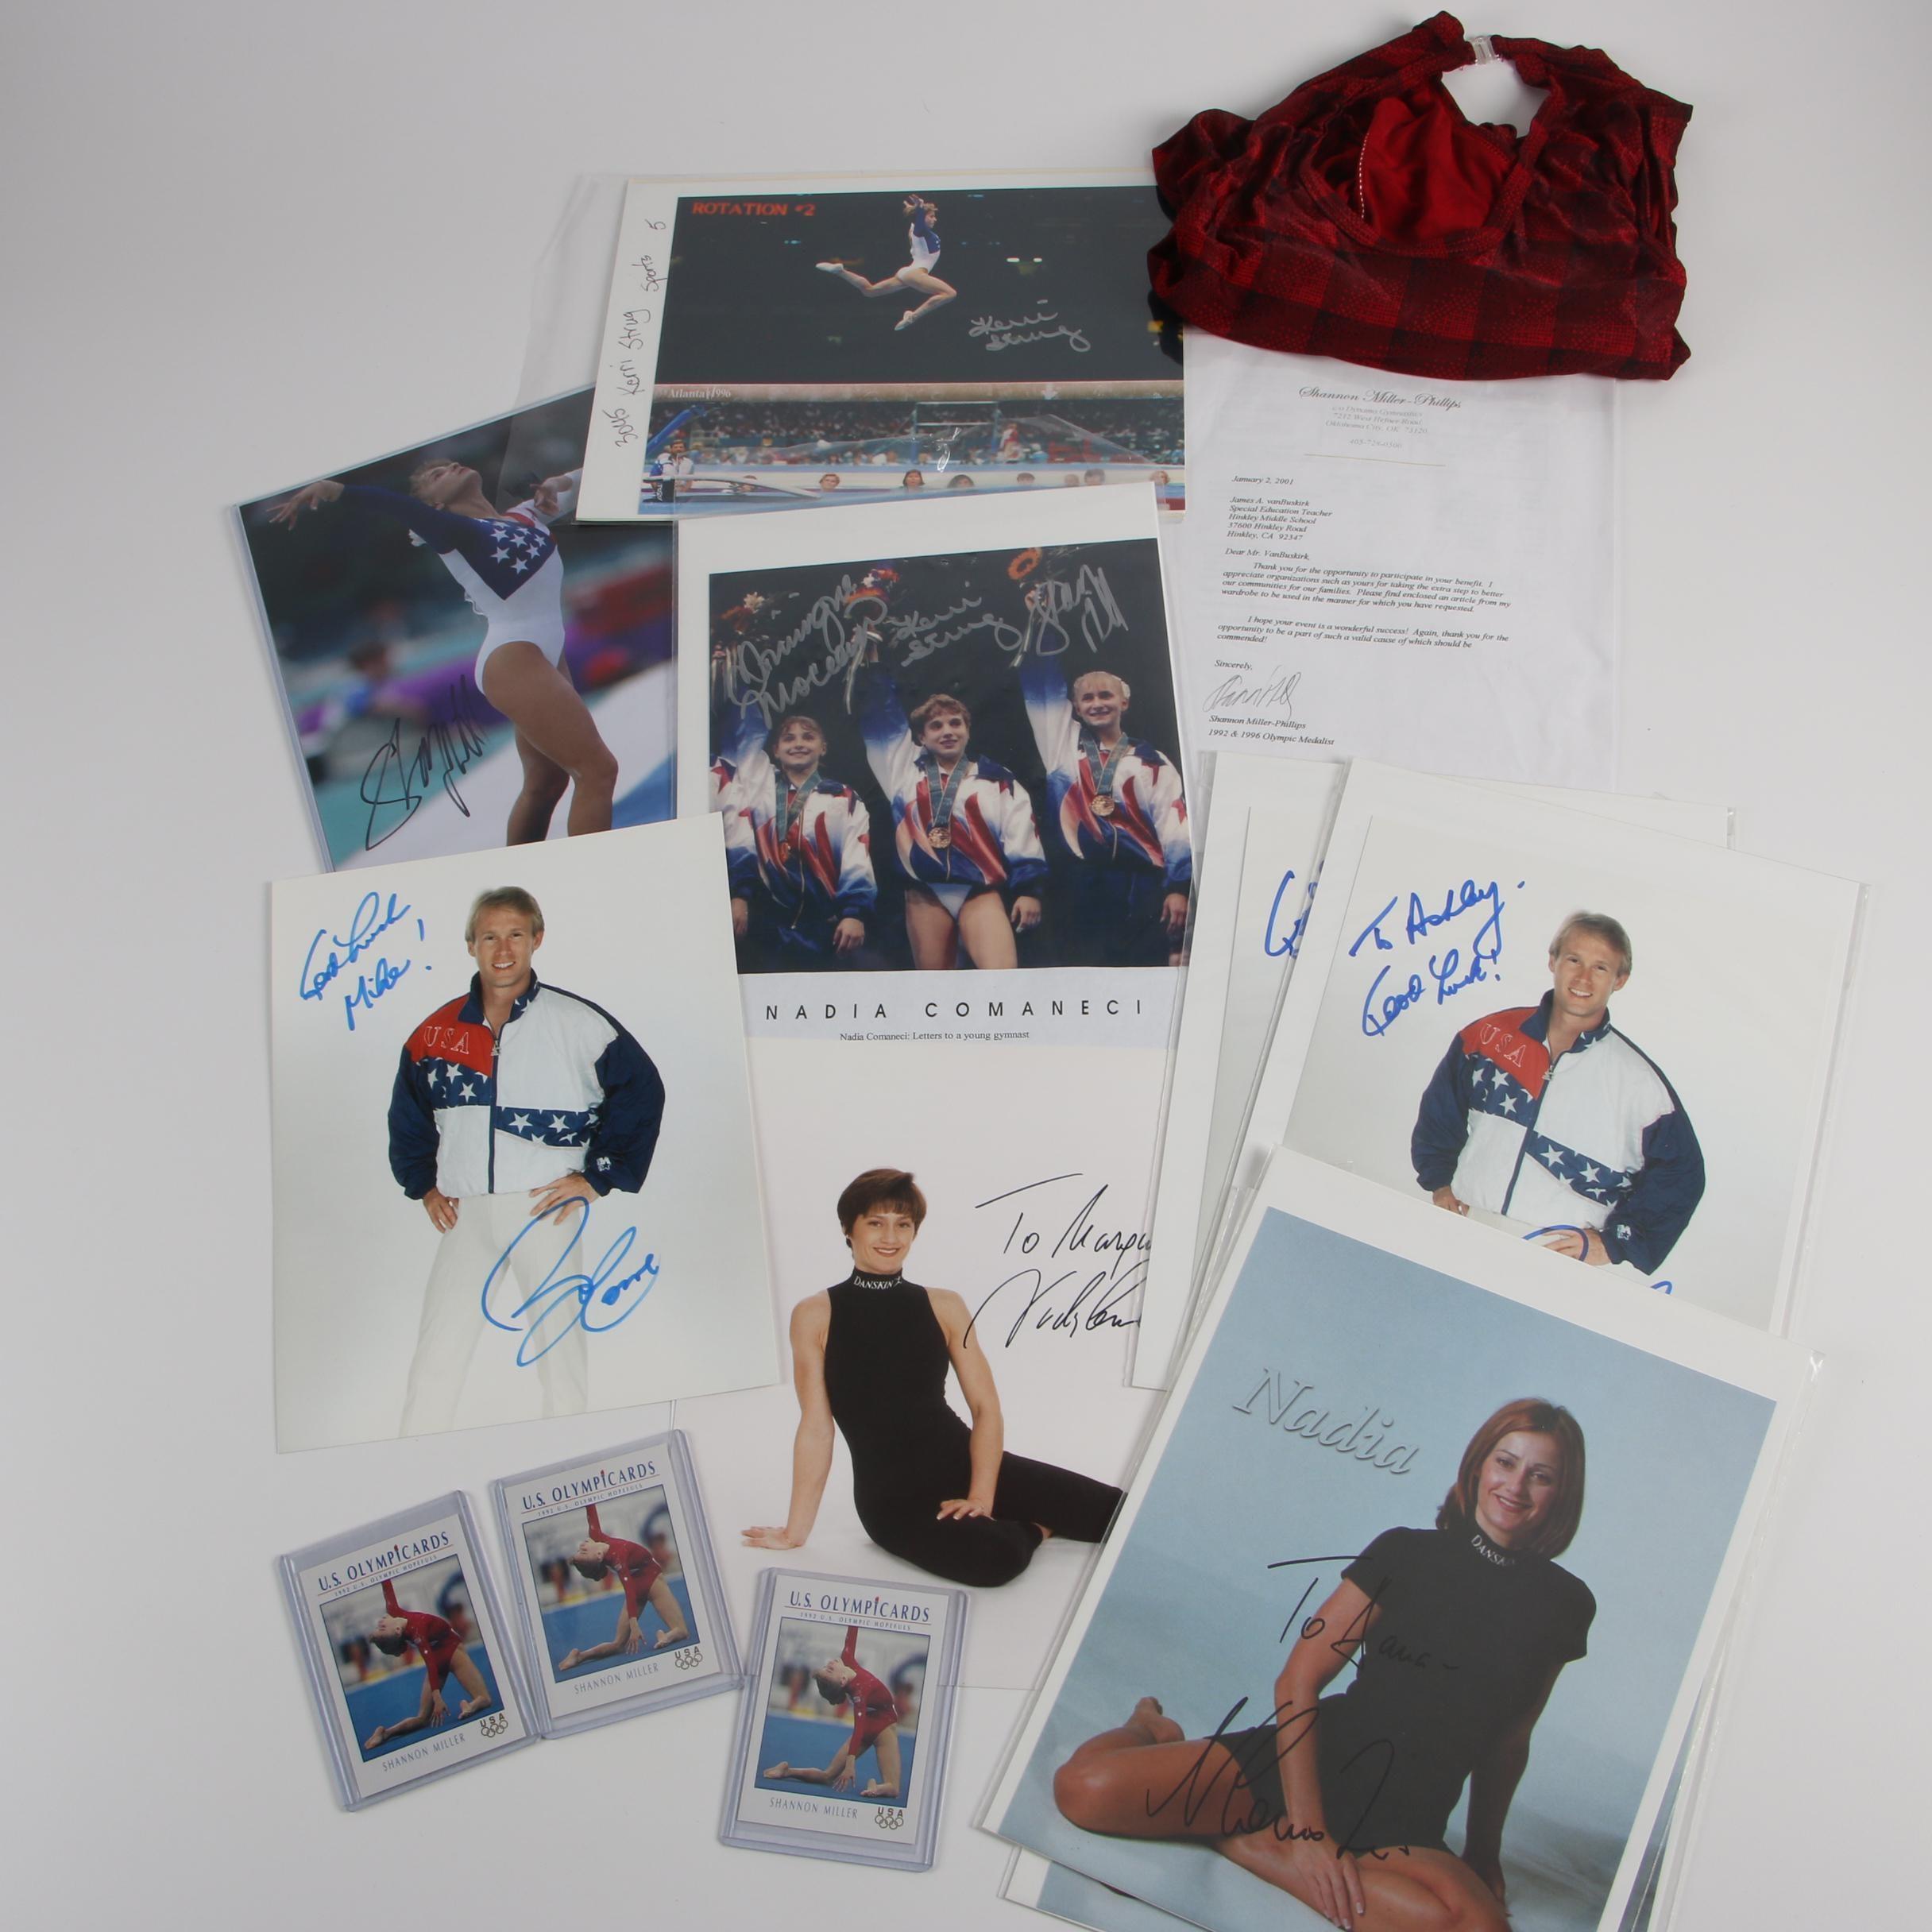 Kerri Strug and Other Olympic Gymnast Autographs